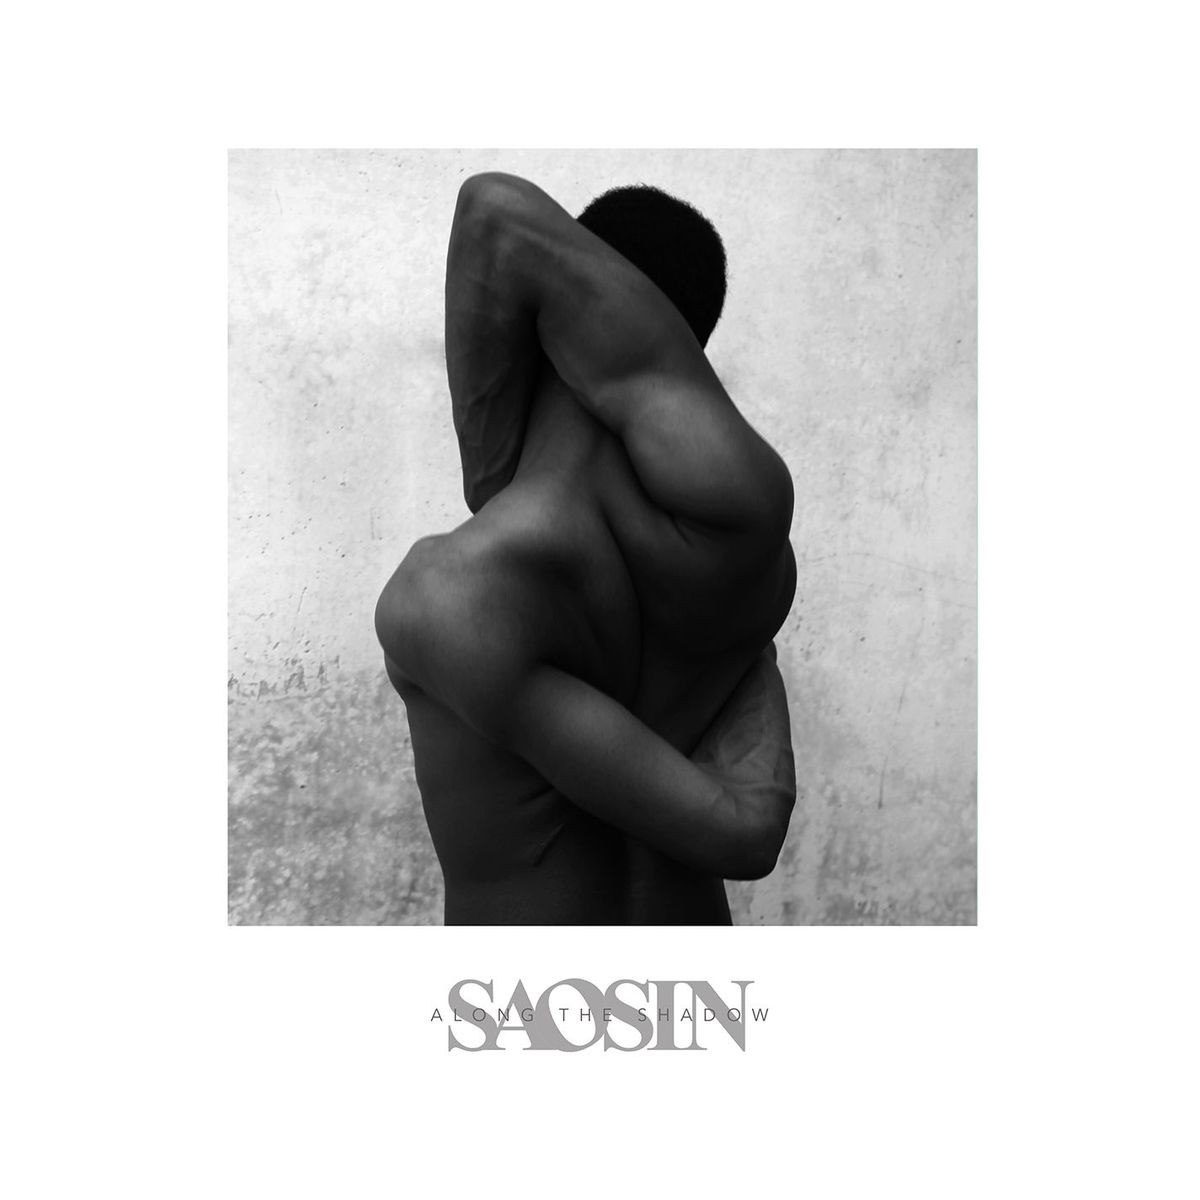 Saosin - The Silver String [single] (2016)